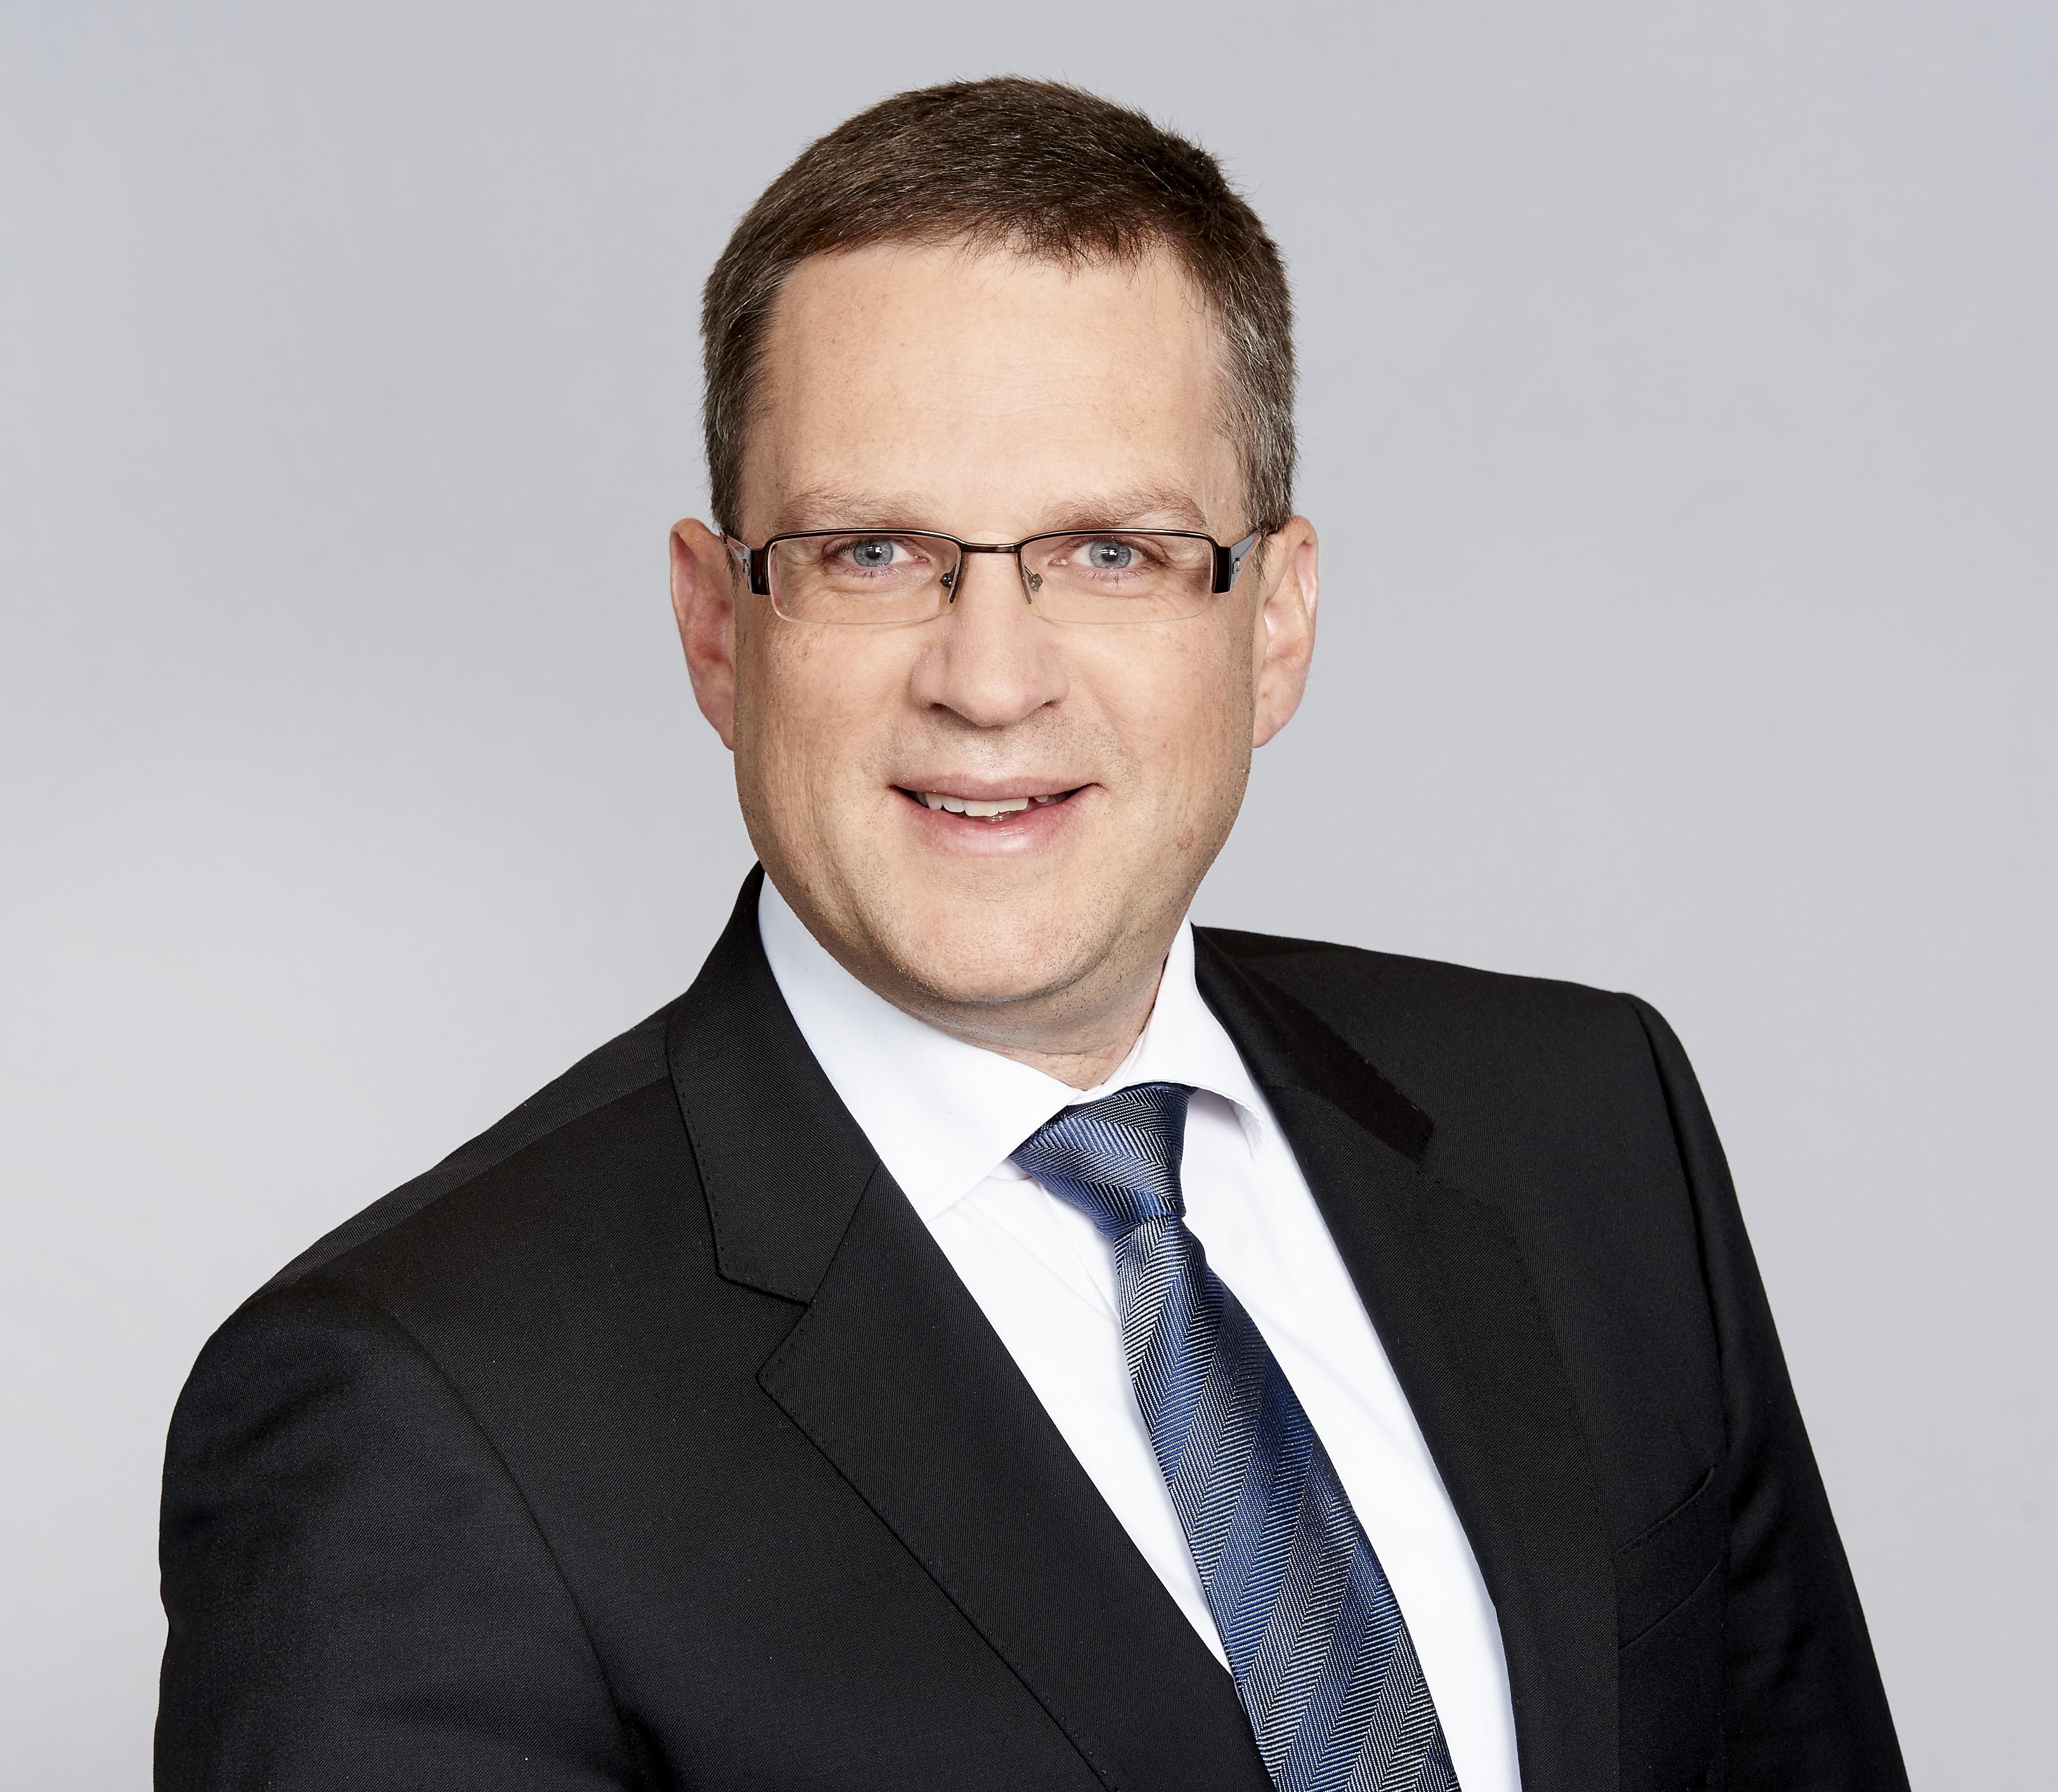 August Wöginger (cropped).jpg